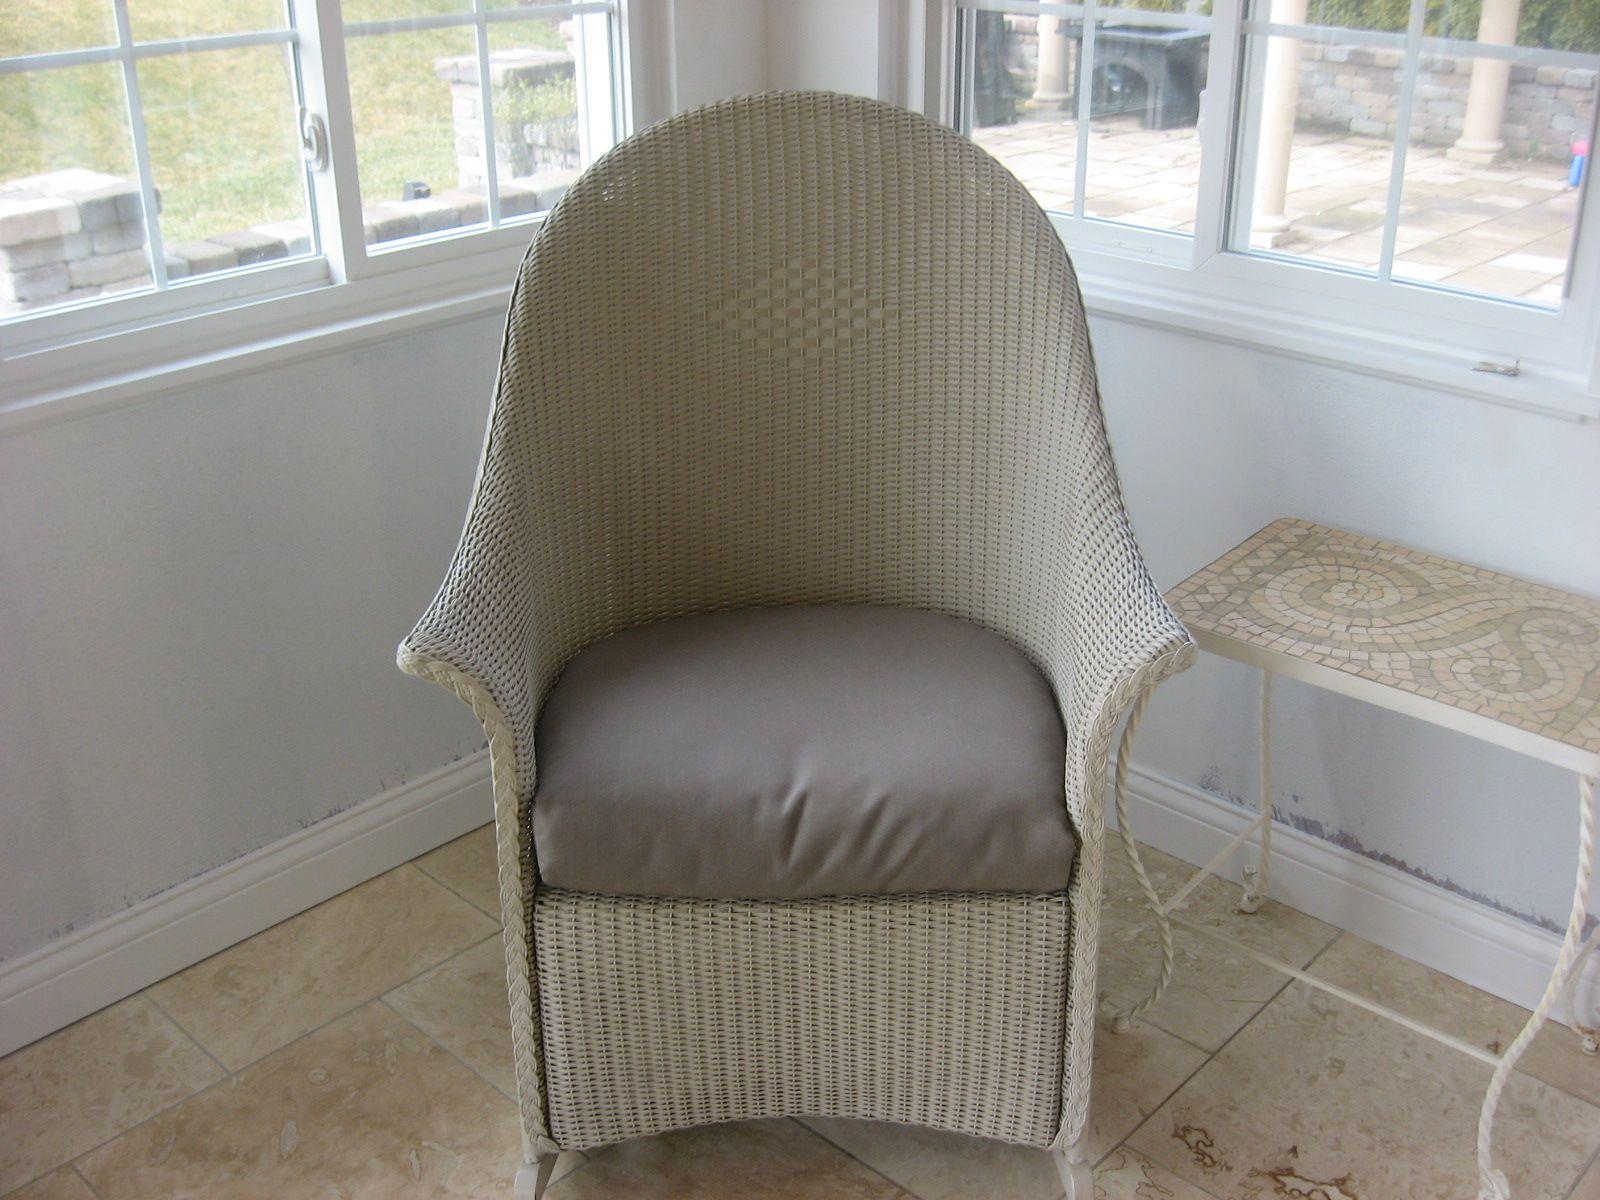 Attirant Boxed Chair Cushion   Westerville, Ohio